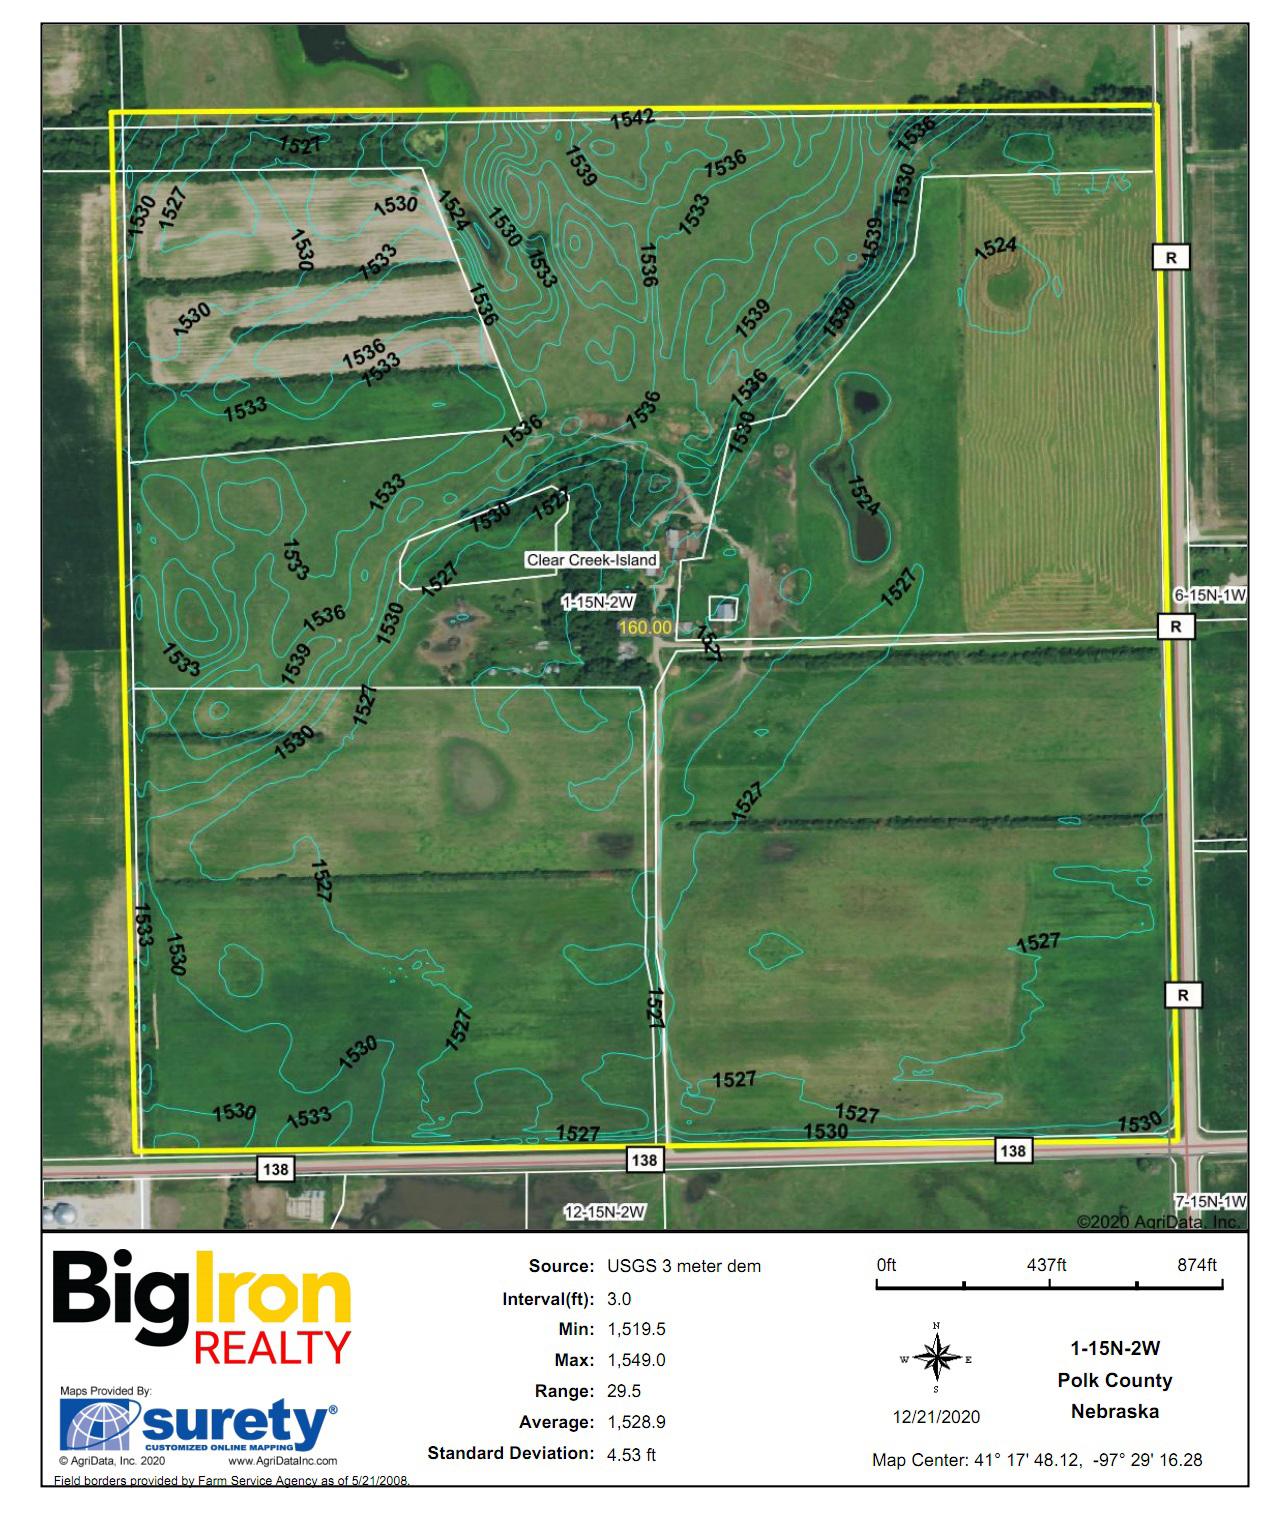 Topography Contours-BIR2105